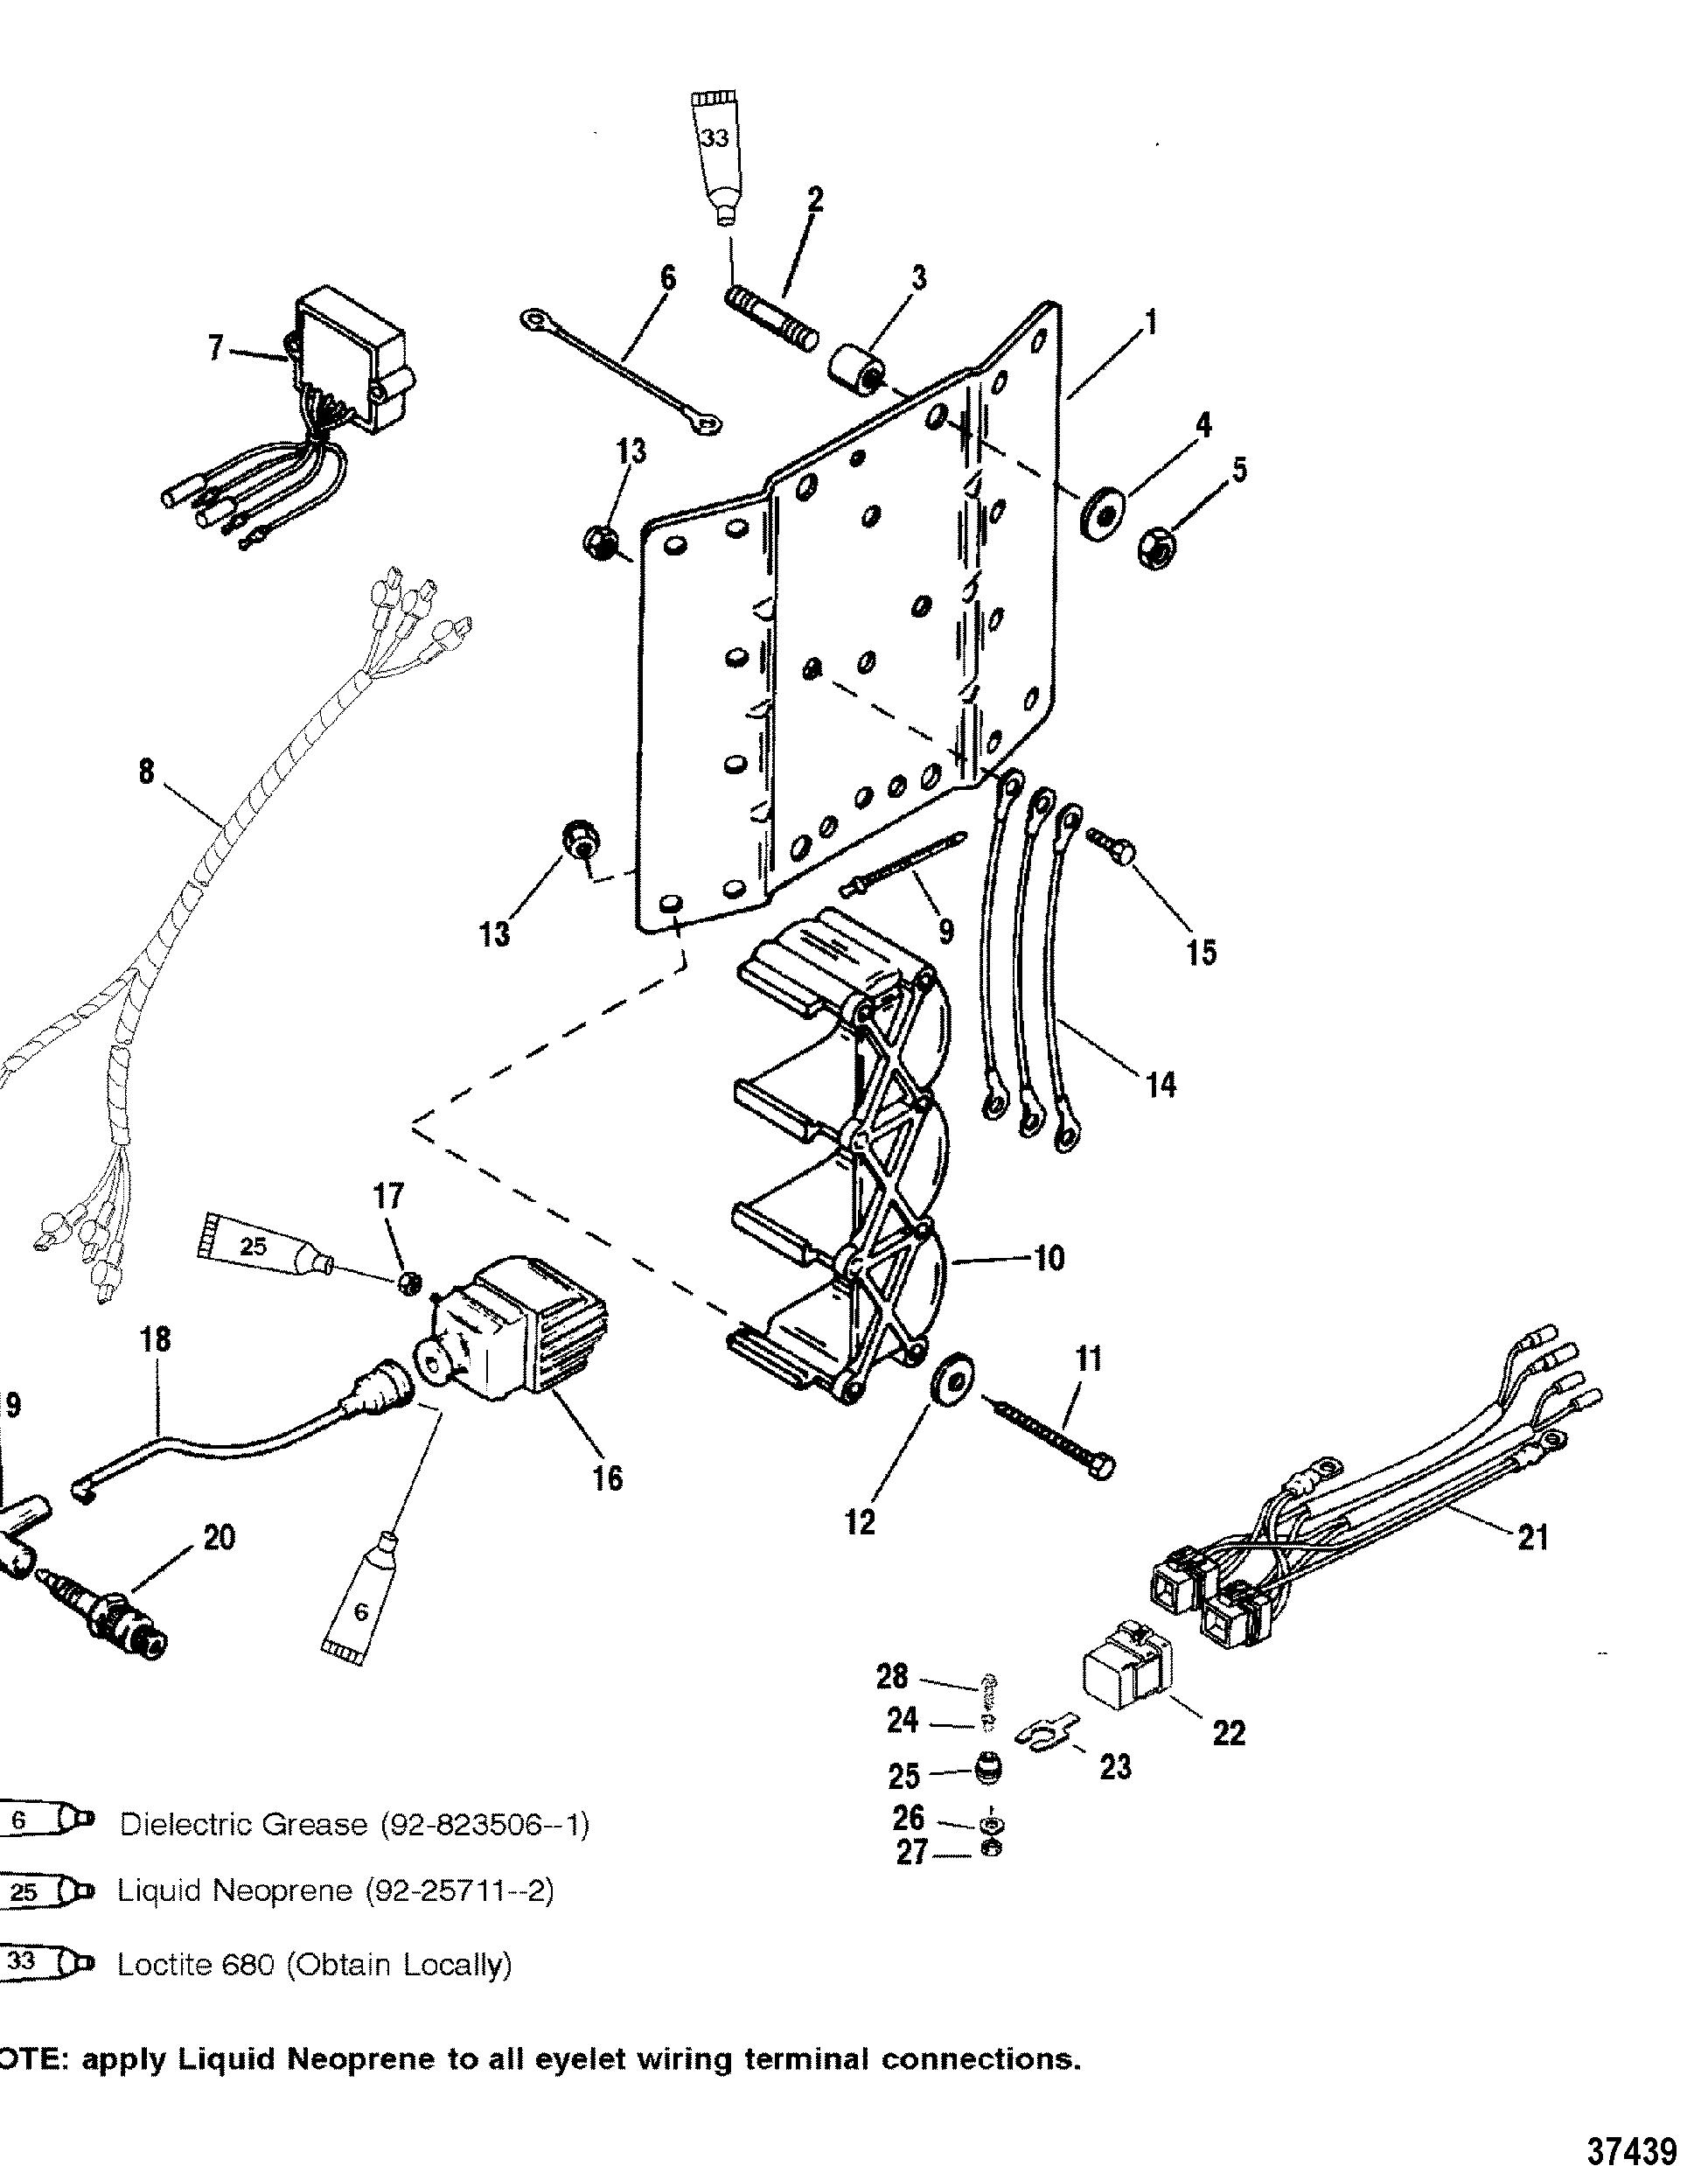 Ignition Coil Voltage Regulator For Mariner Mercury 150